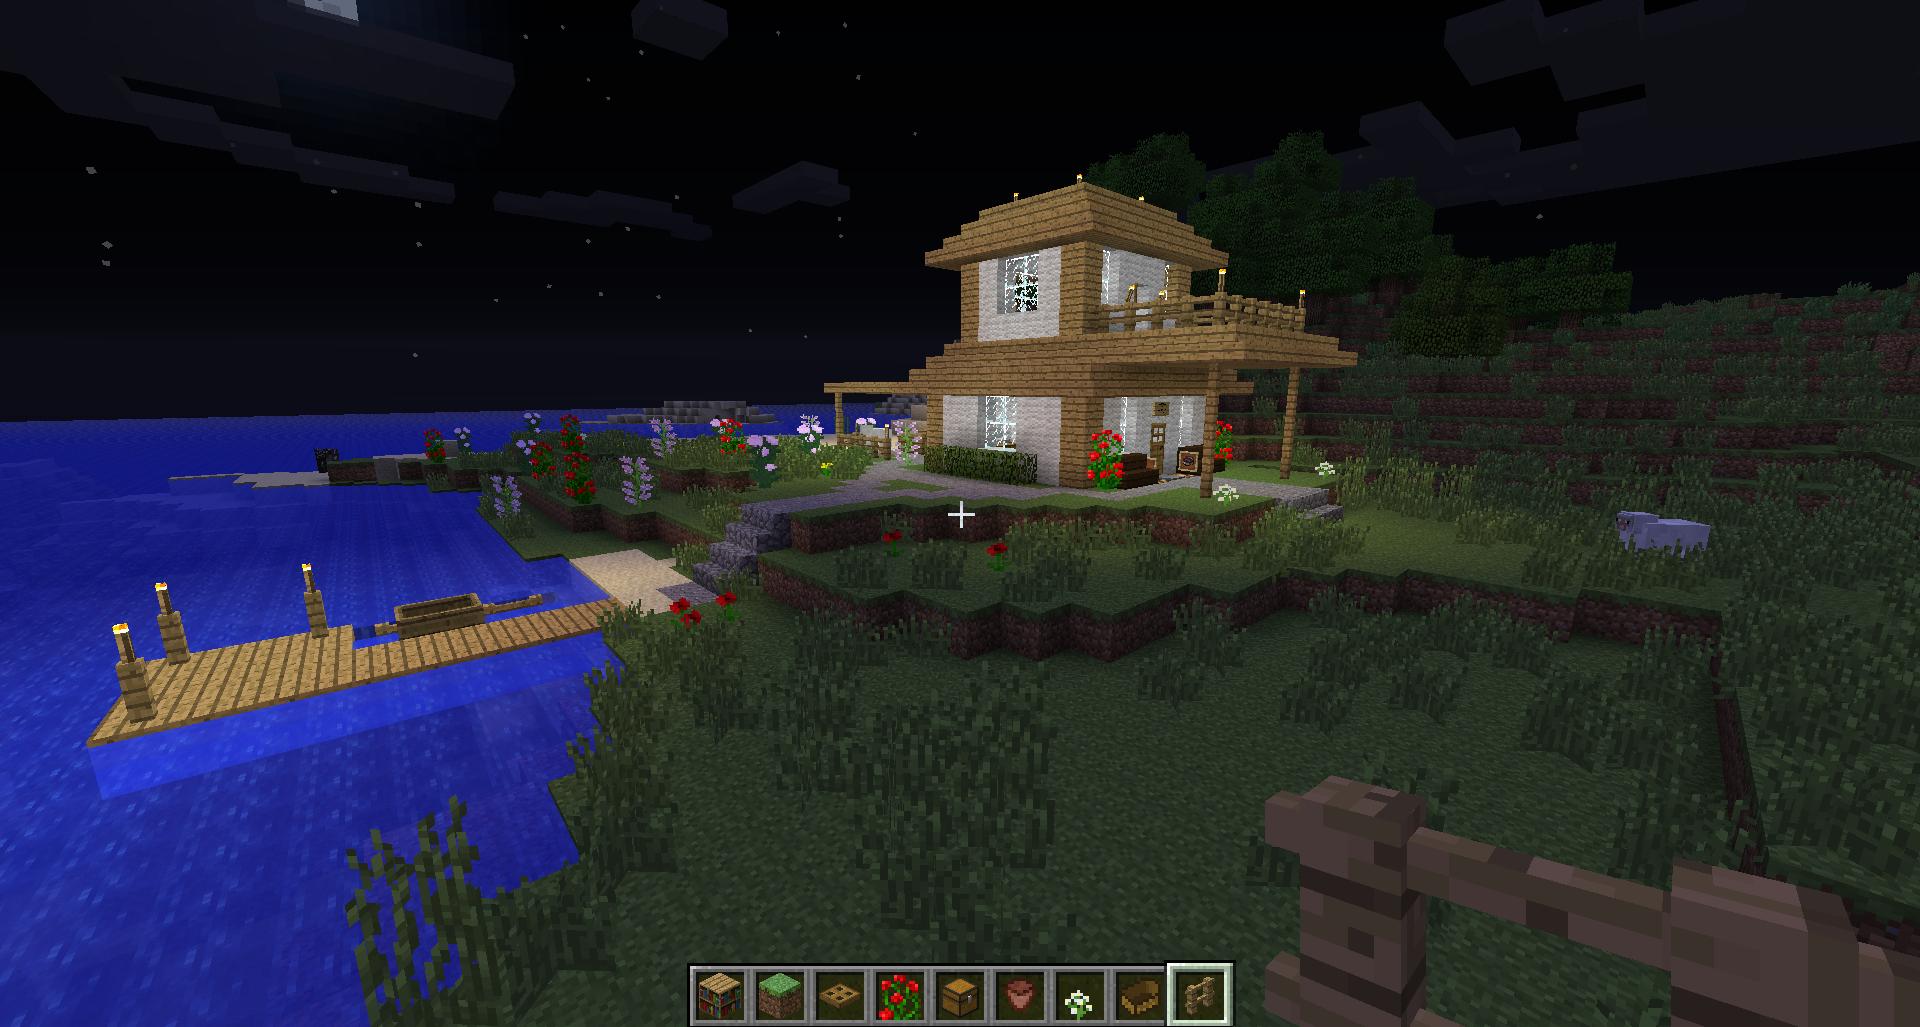 108 170 54 82:38003 : LizC864 Minecraft: My 15th structure